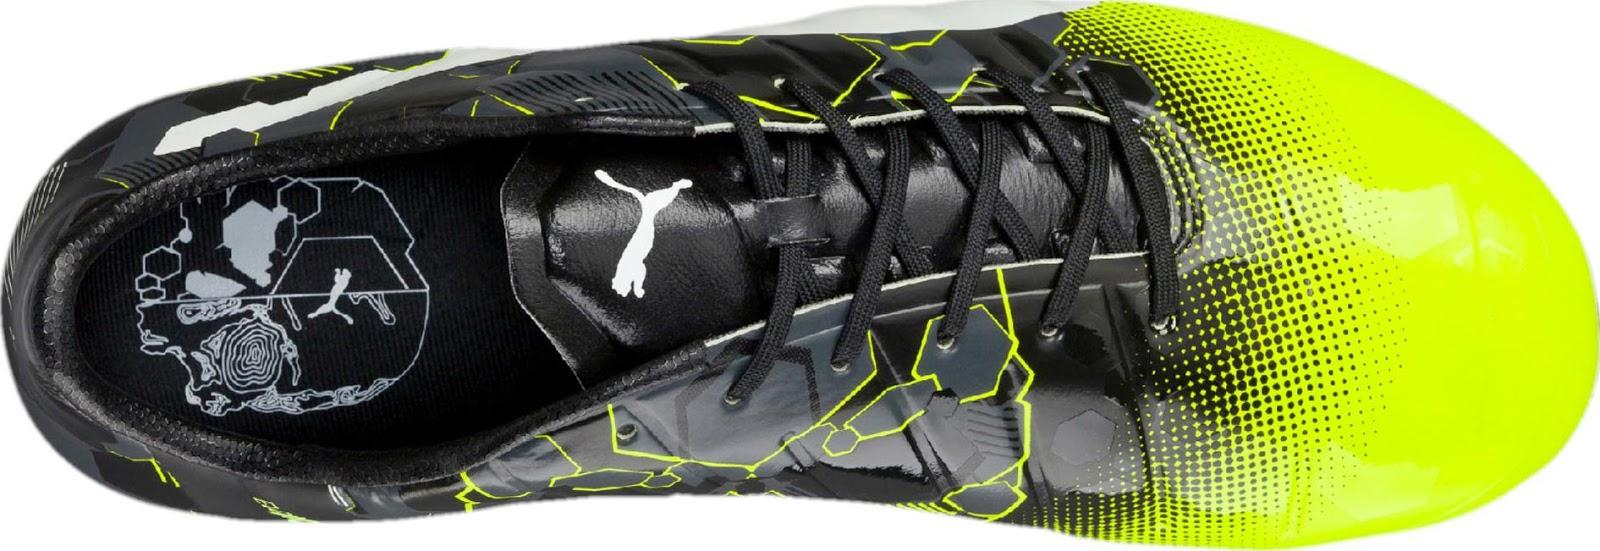 puma-evopower-graphic-2016-2017-boots-overhead